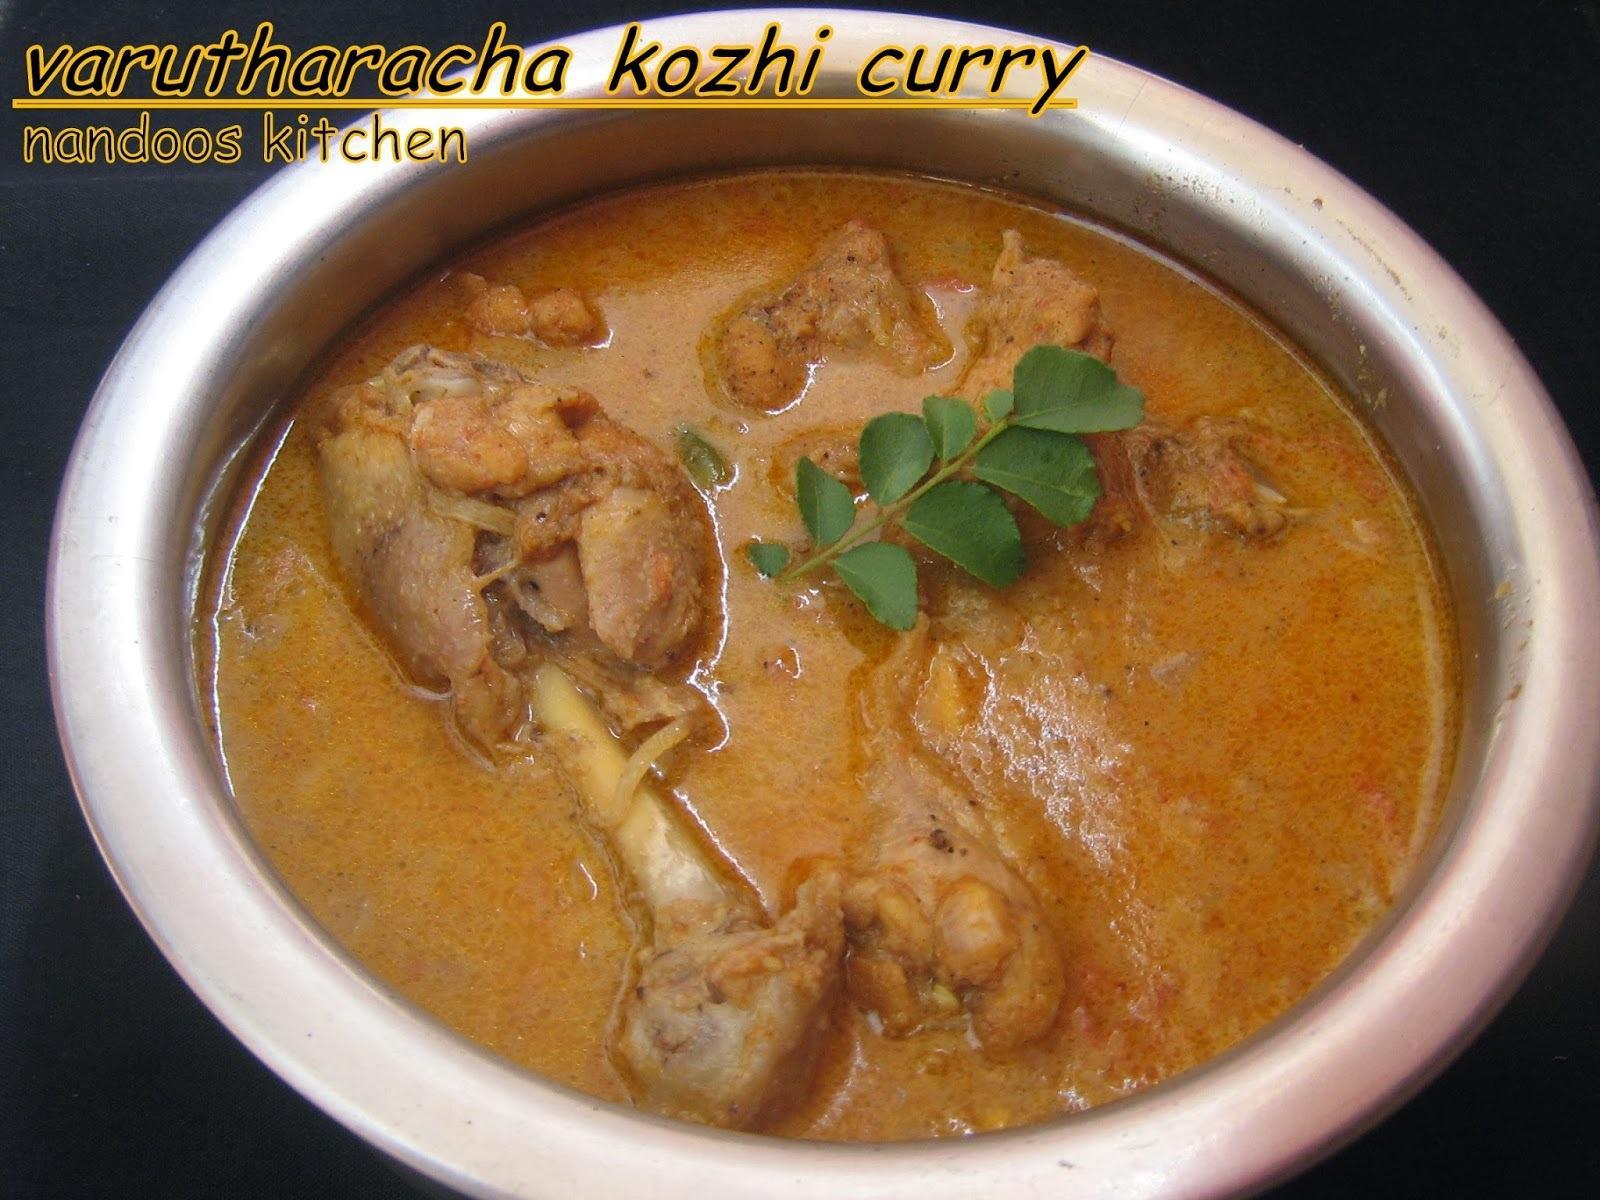 varutharacha kozhi curry / varutharacha chicken curry / chicken in roasted coconut gravy / chicken curry